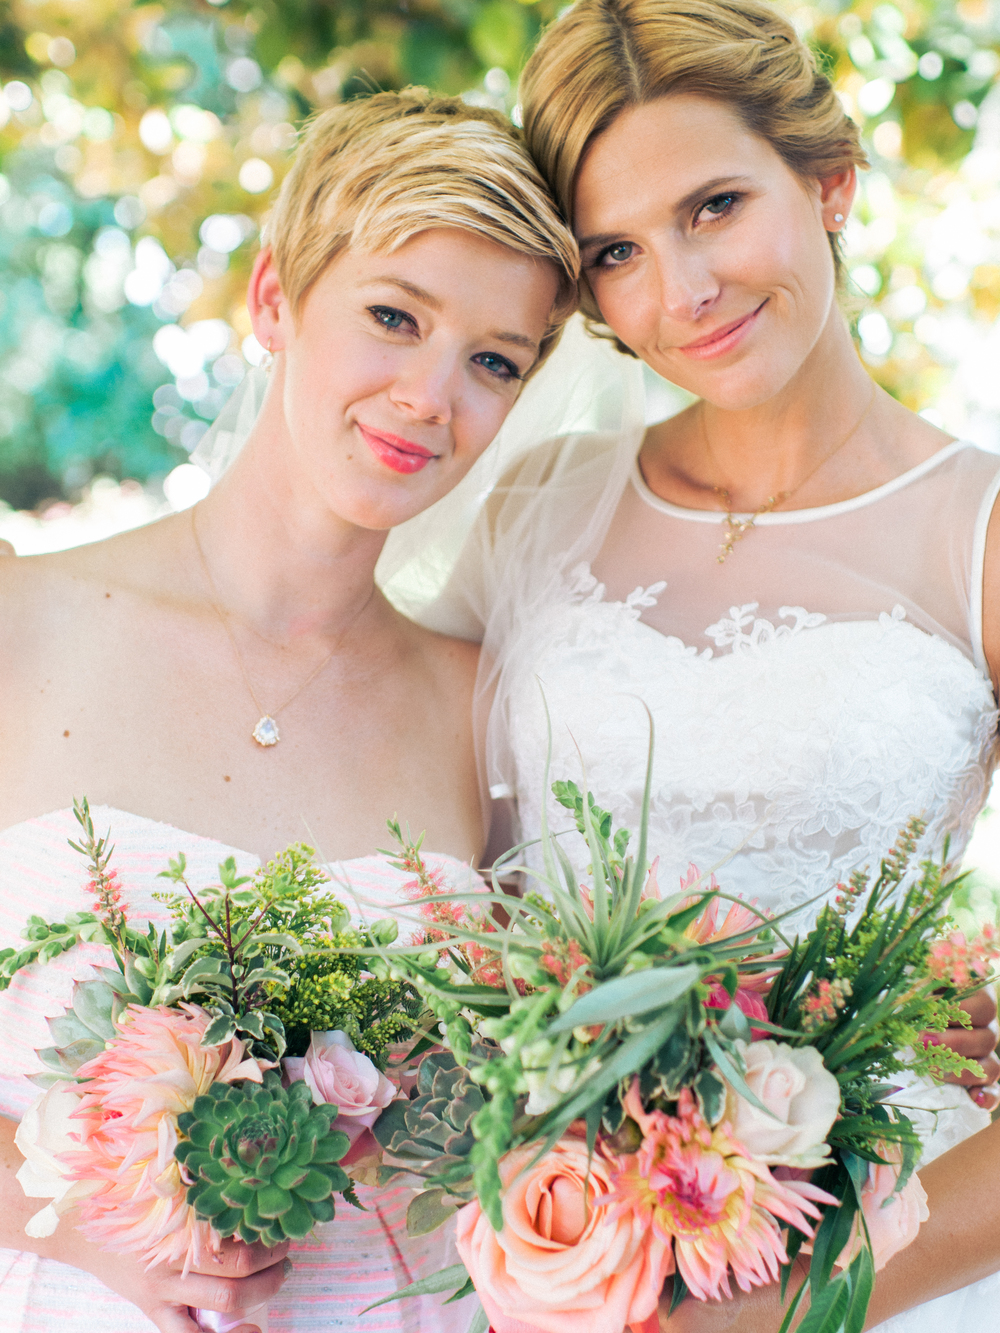 Anders Wedding by Jessica Garmon-234.JPG